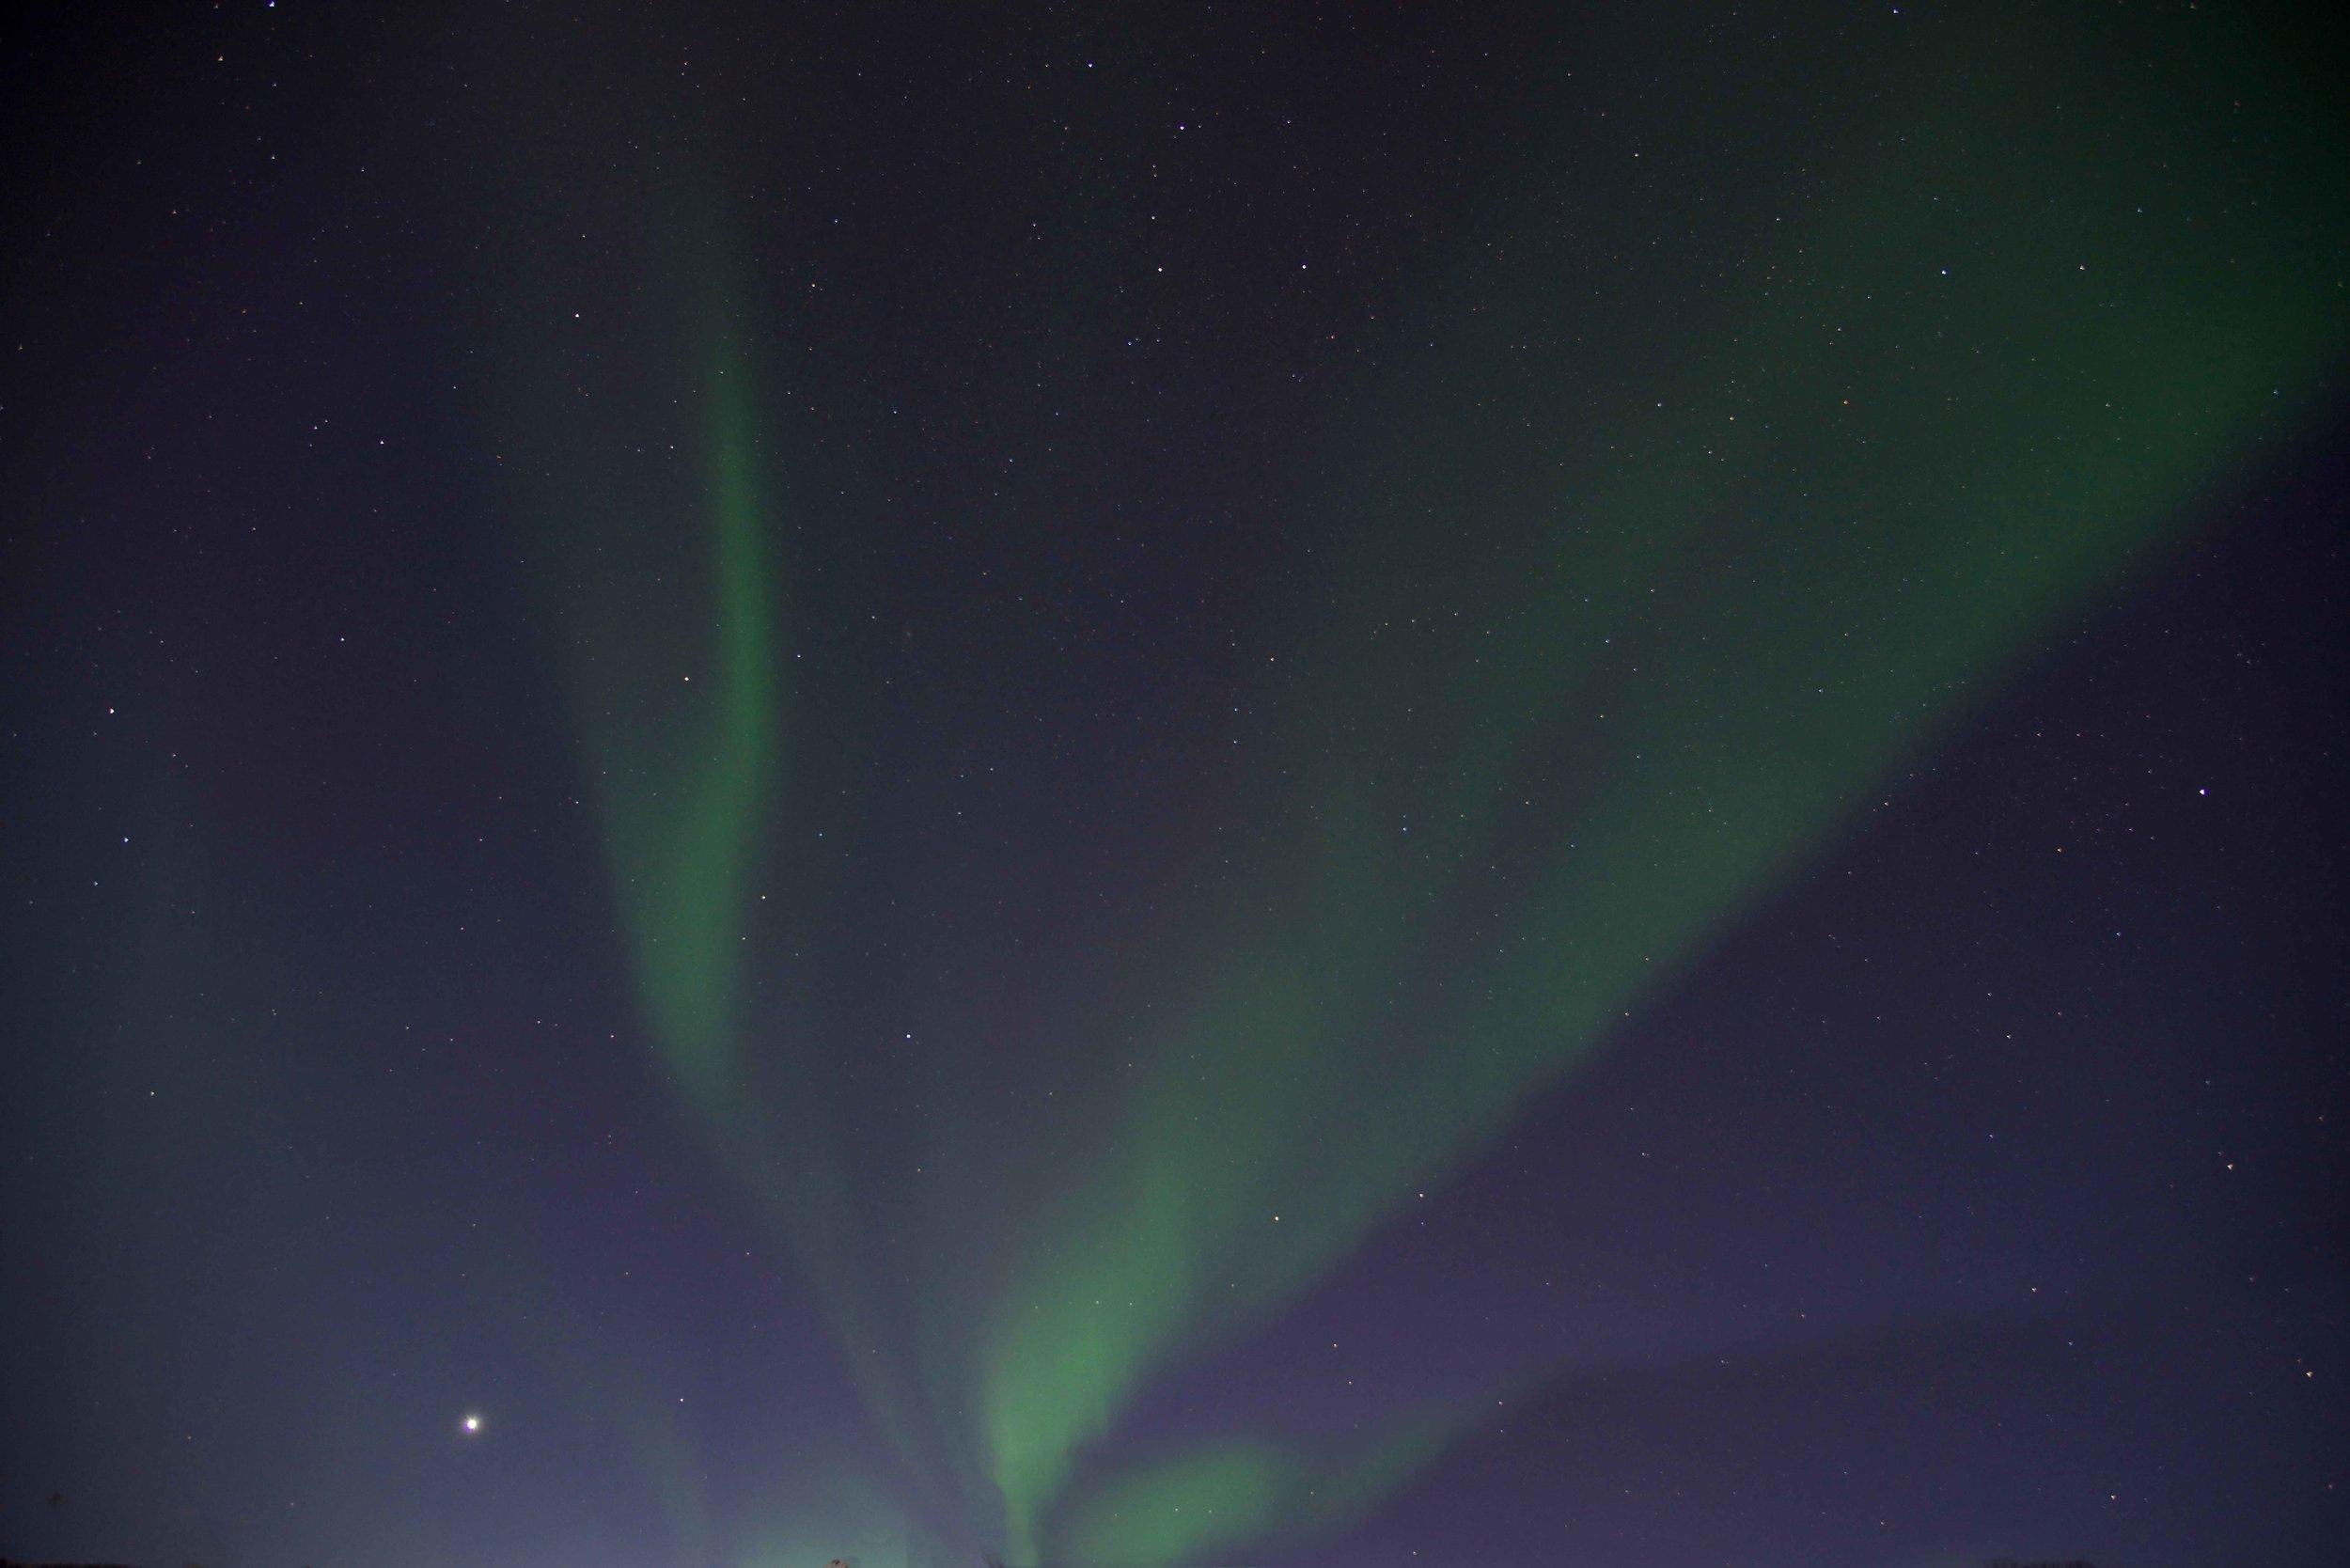 Northern Lights, Aurora Borealis, Lyngen Fjord, shot from Lyngen Lodge,Norway. Image©thingstodot.com